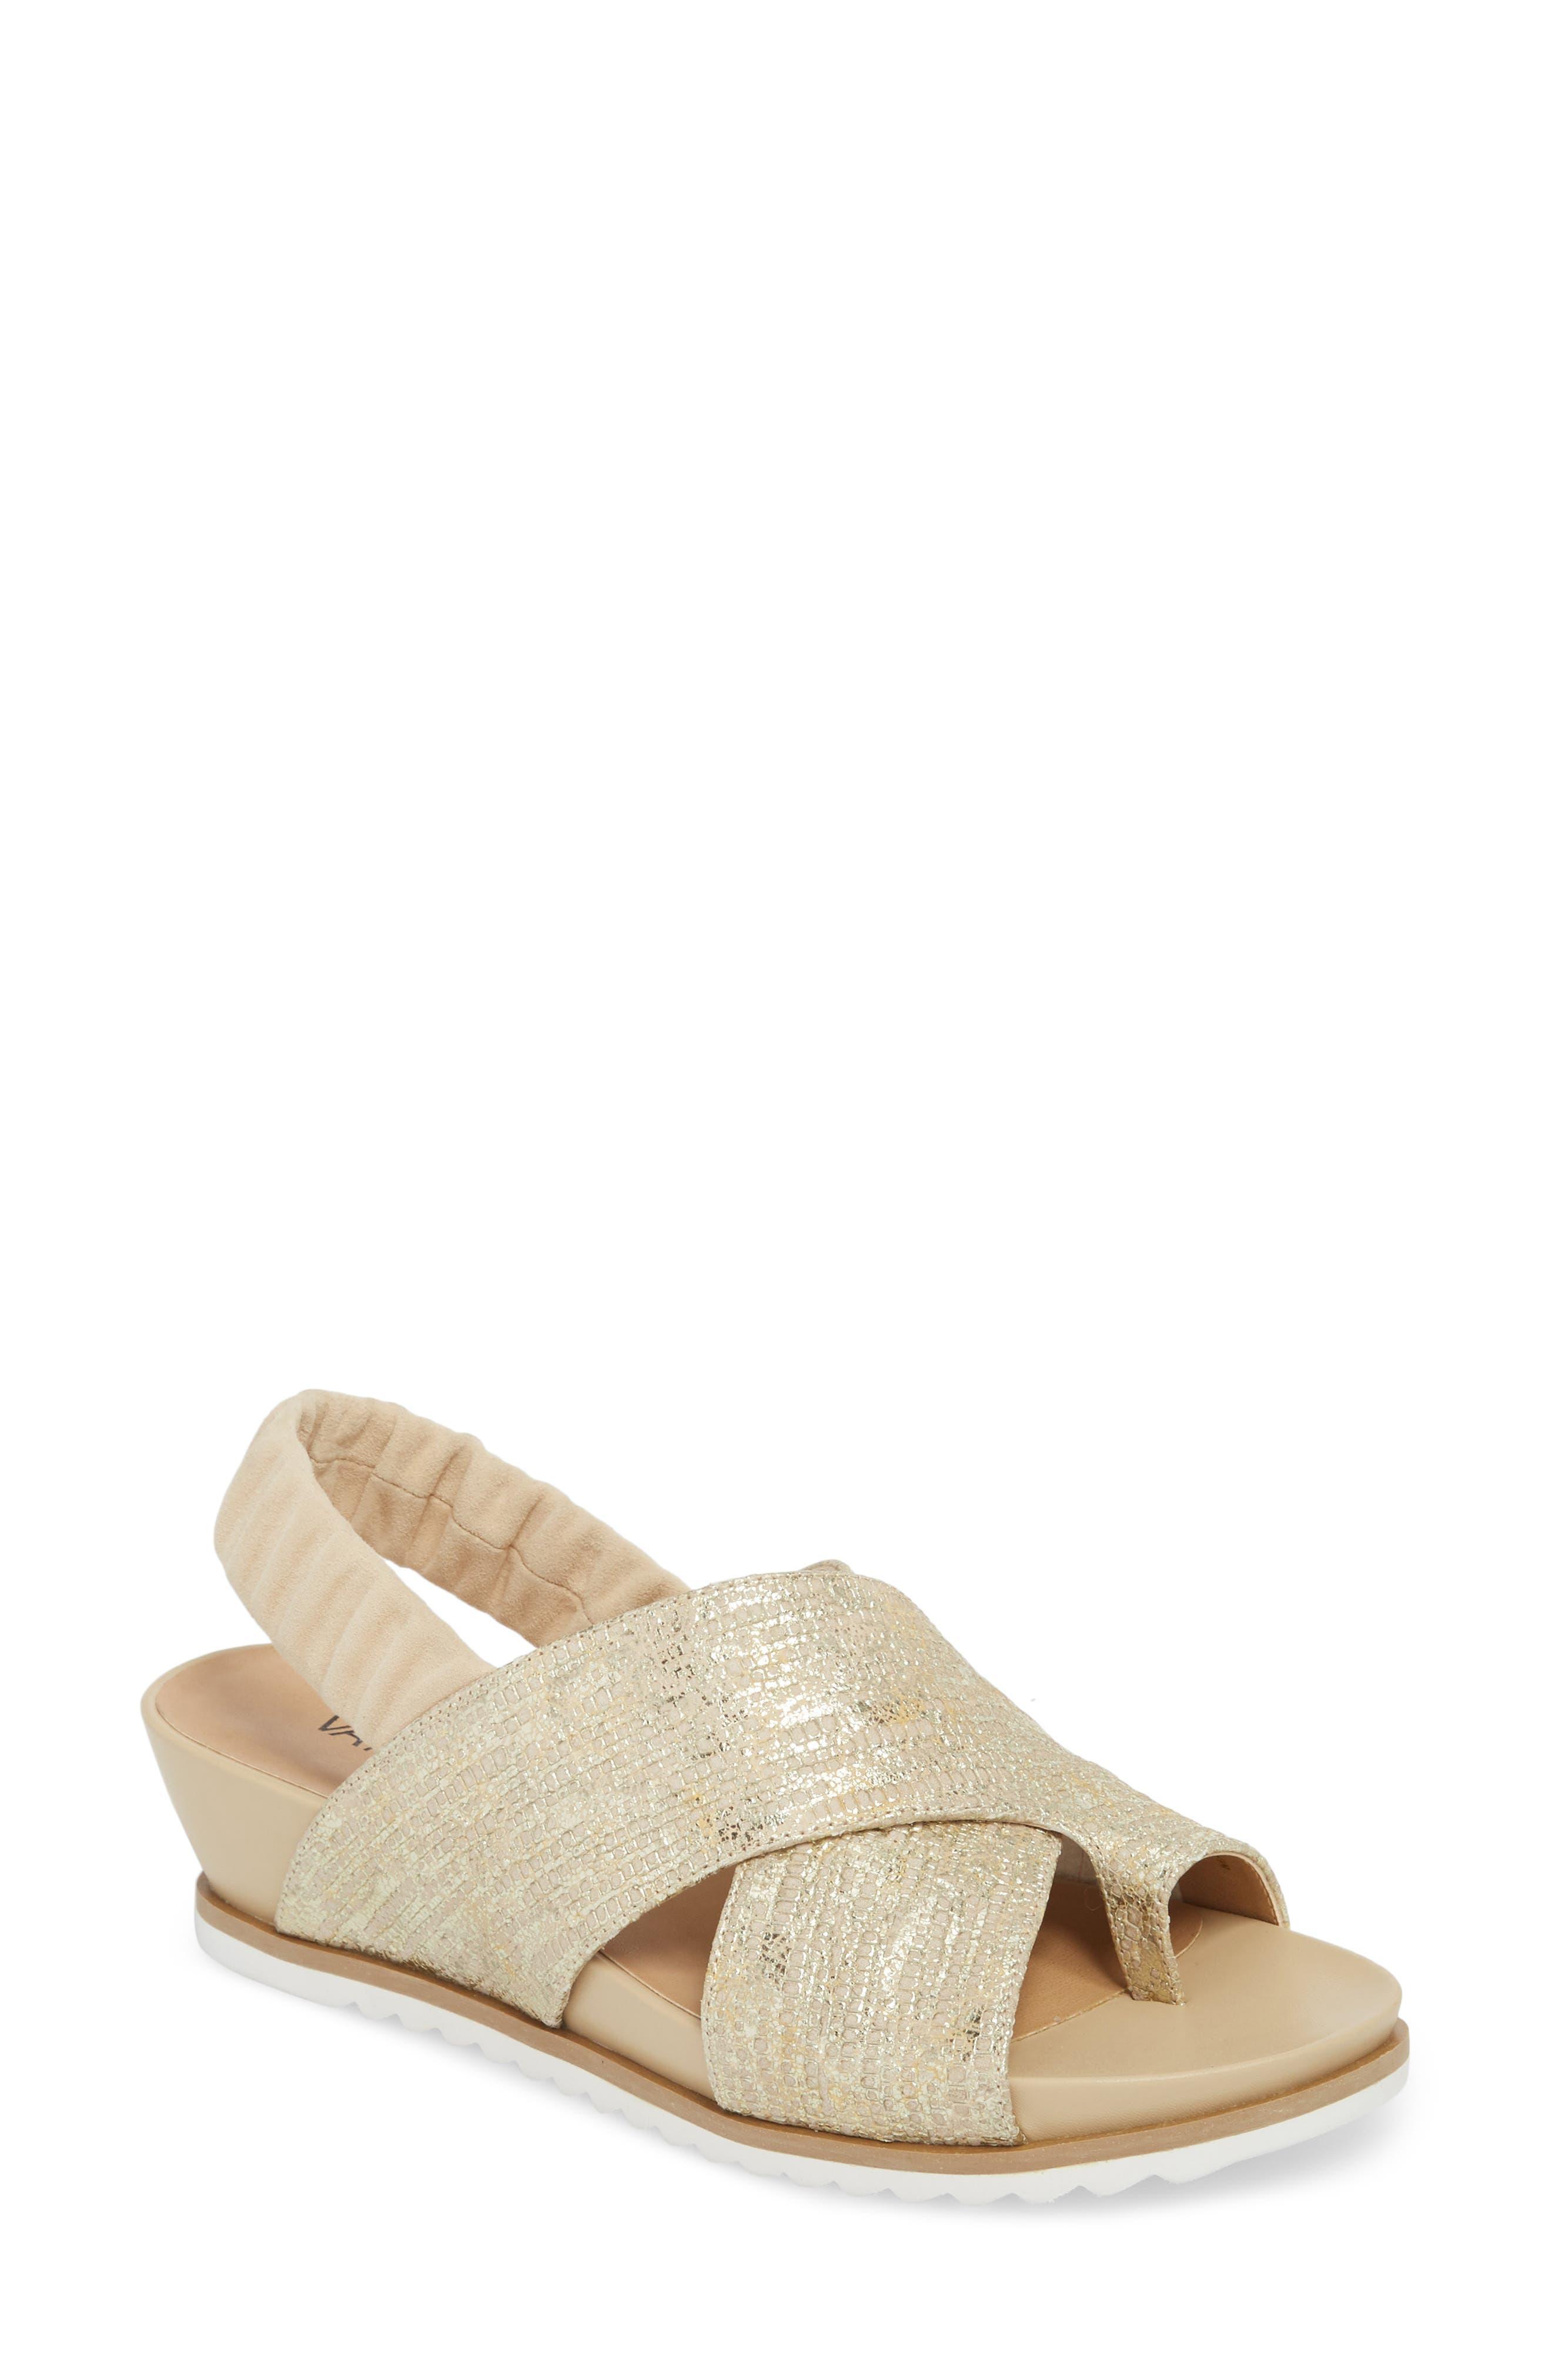 Hendra Slingback Sandal,                             Main thumbnail 1, color,                             Beige Printed Leather